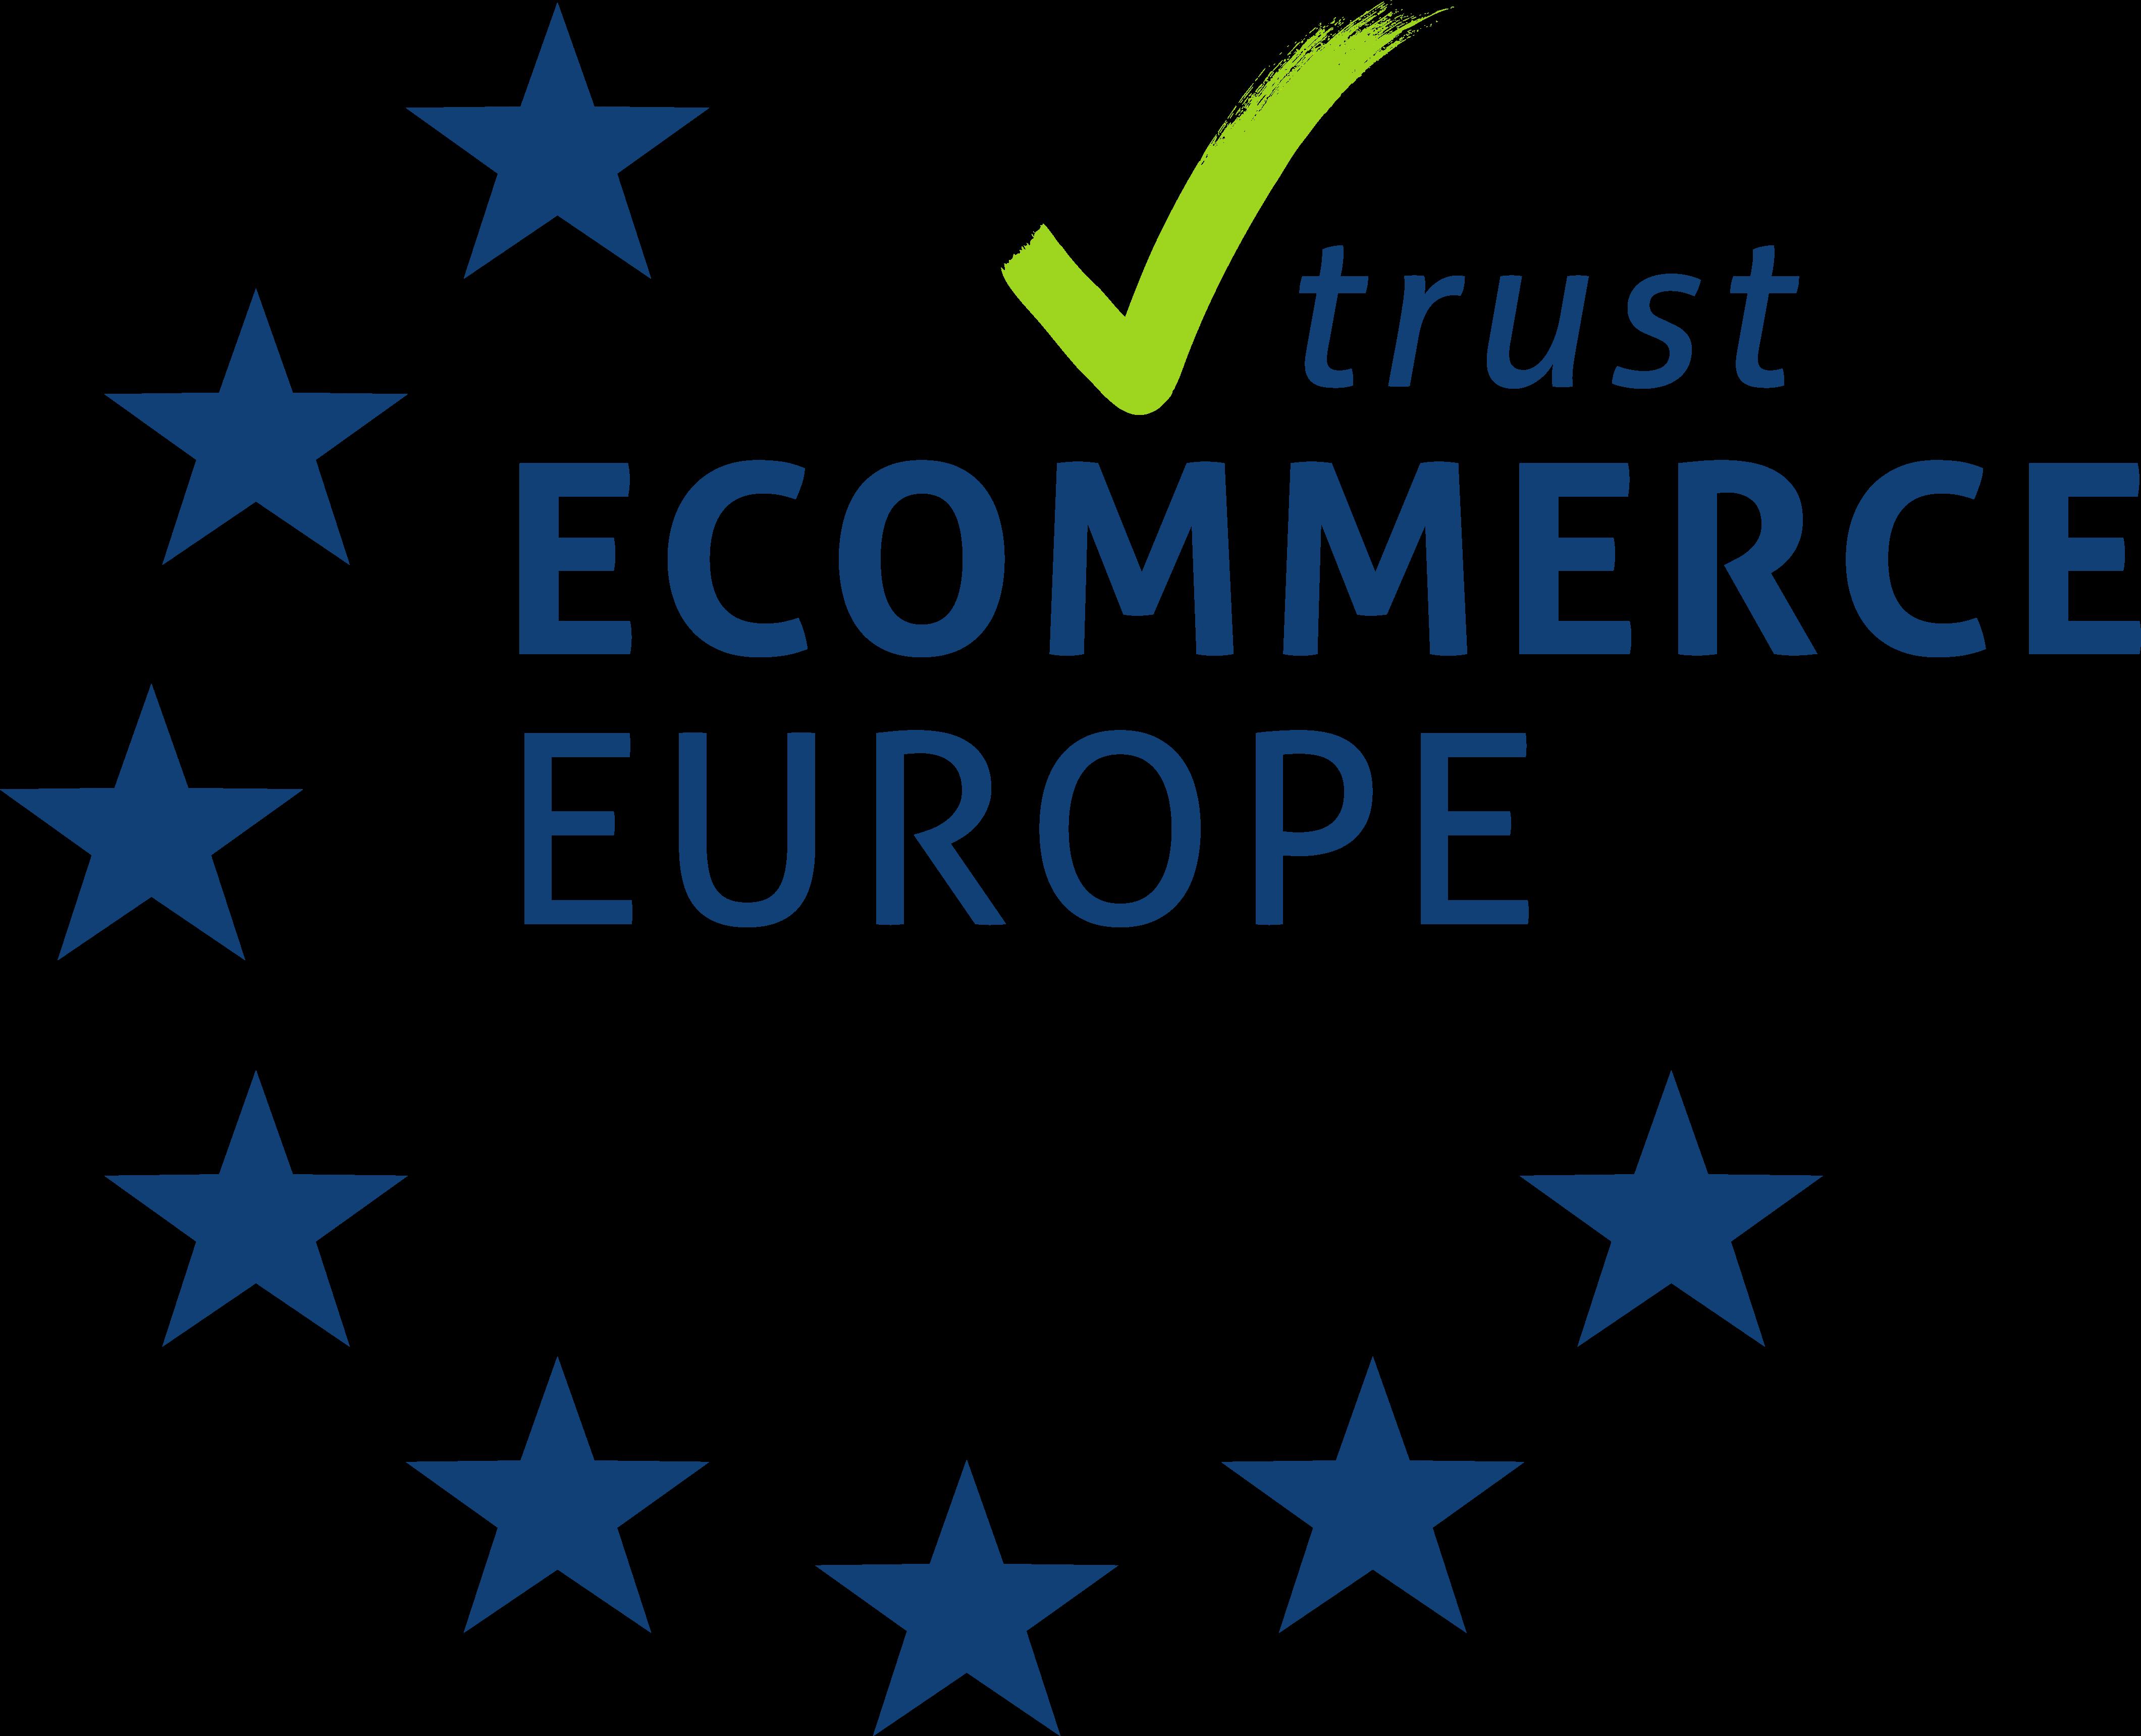 Ecommerece Europe Trustmark